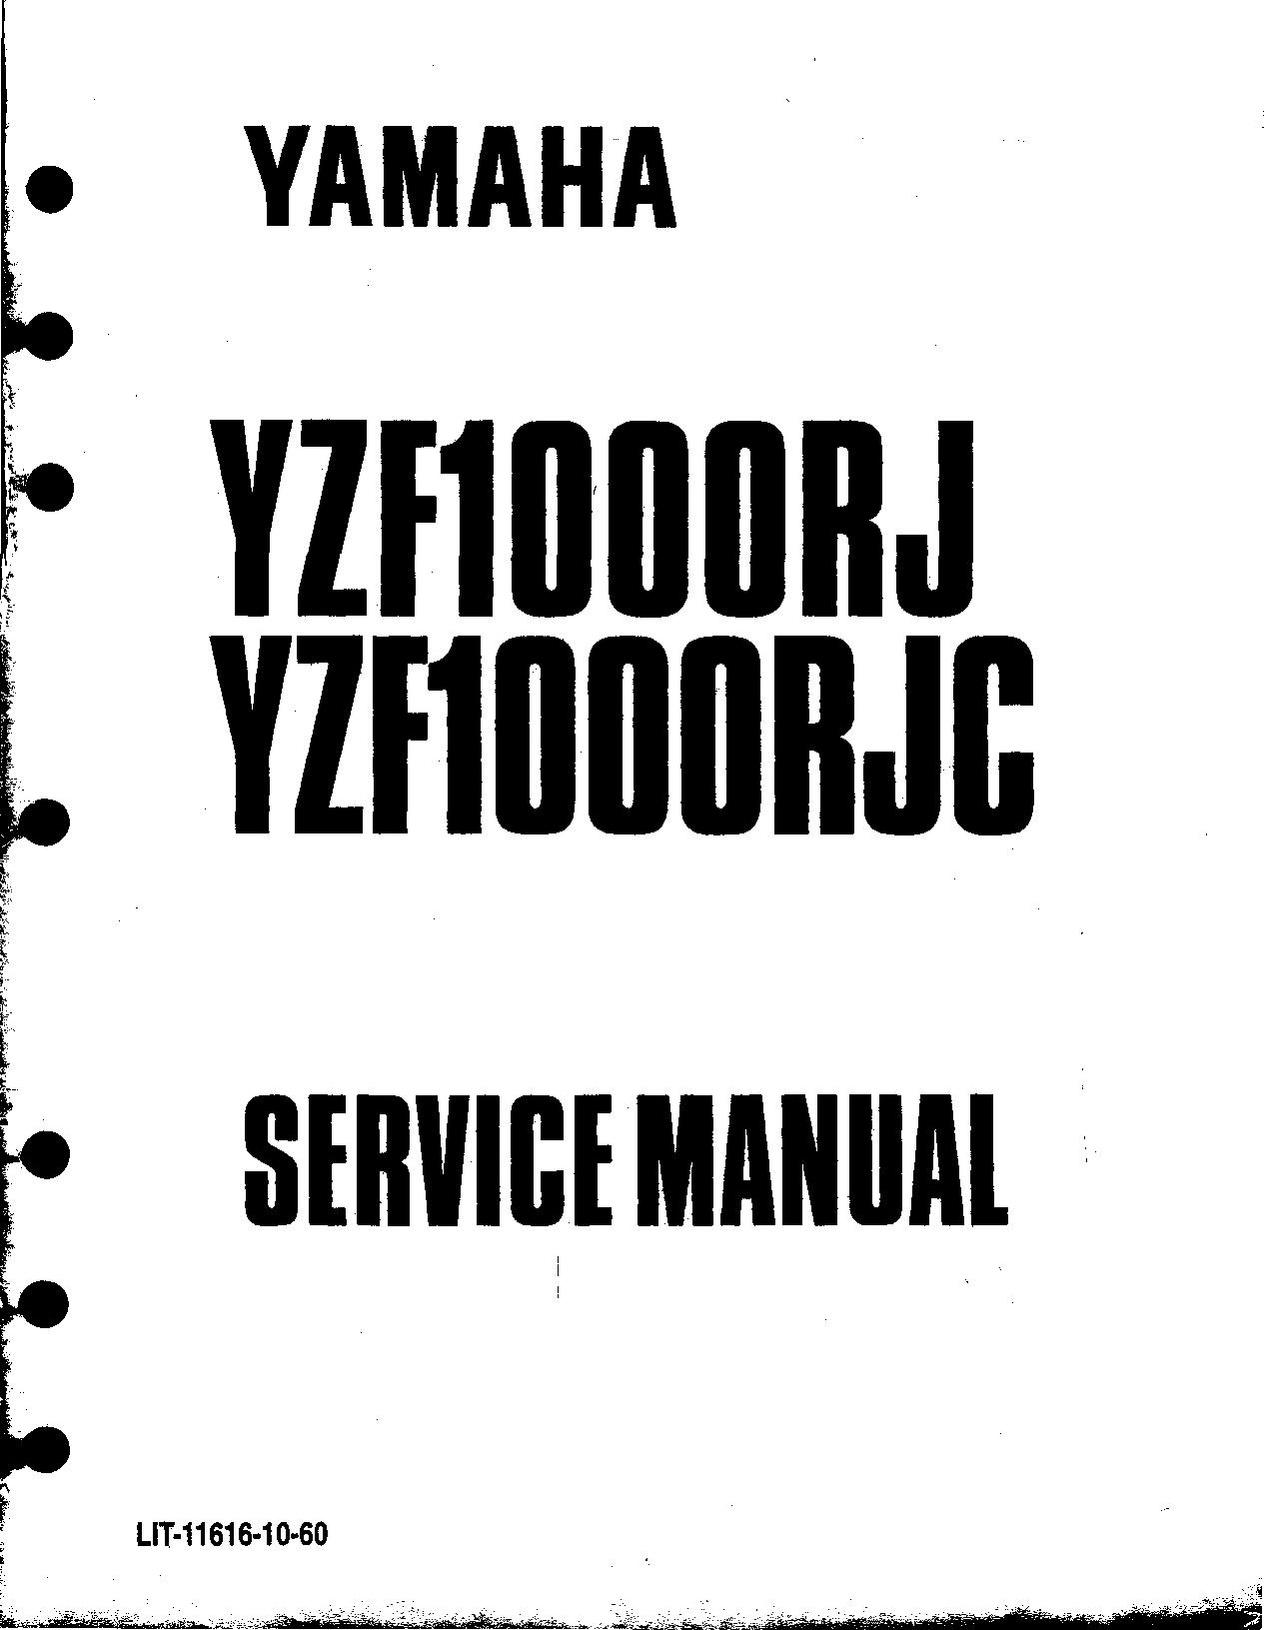 File Yamaha Yzf Rj Rjc Service Manual